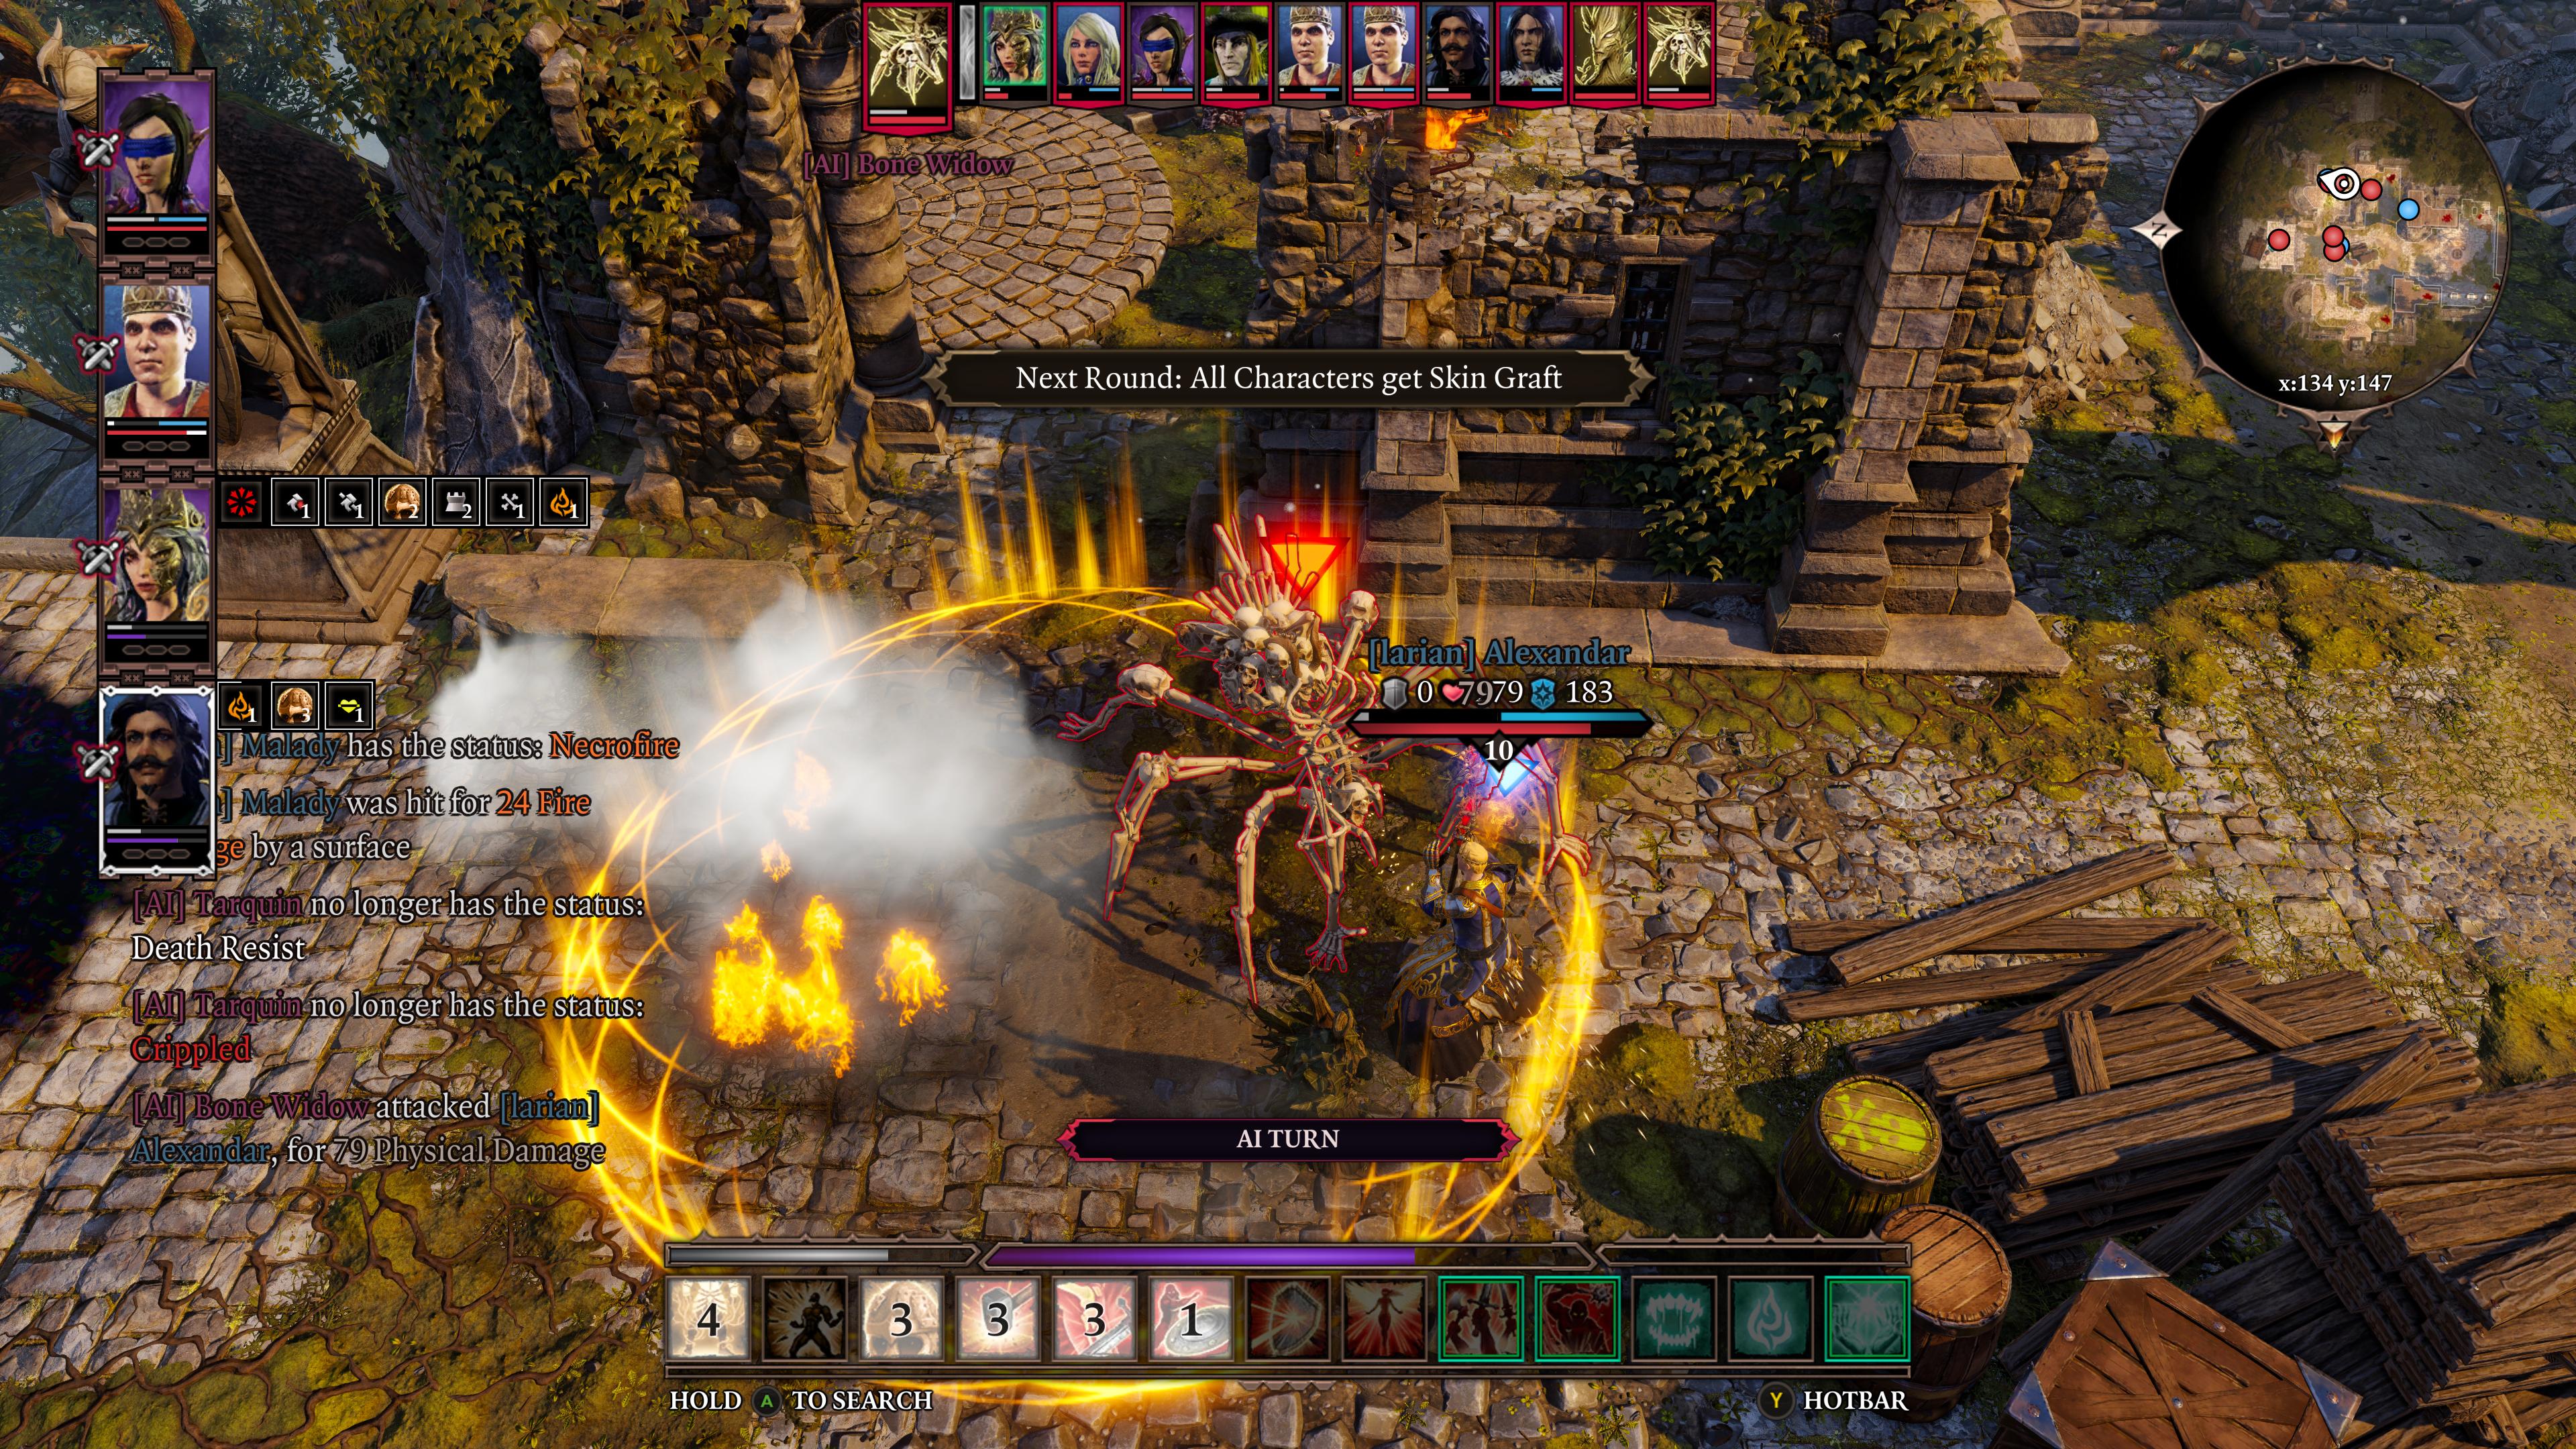 Revamped Arena Mode details for Divinity: Original Sin 2